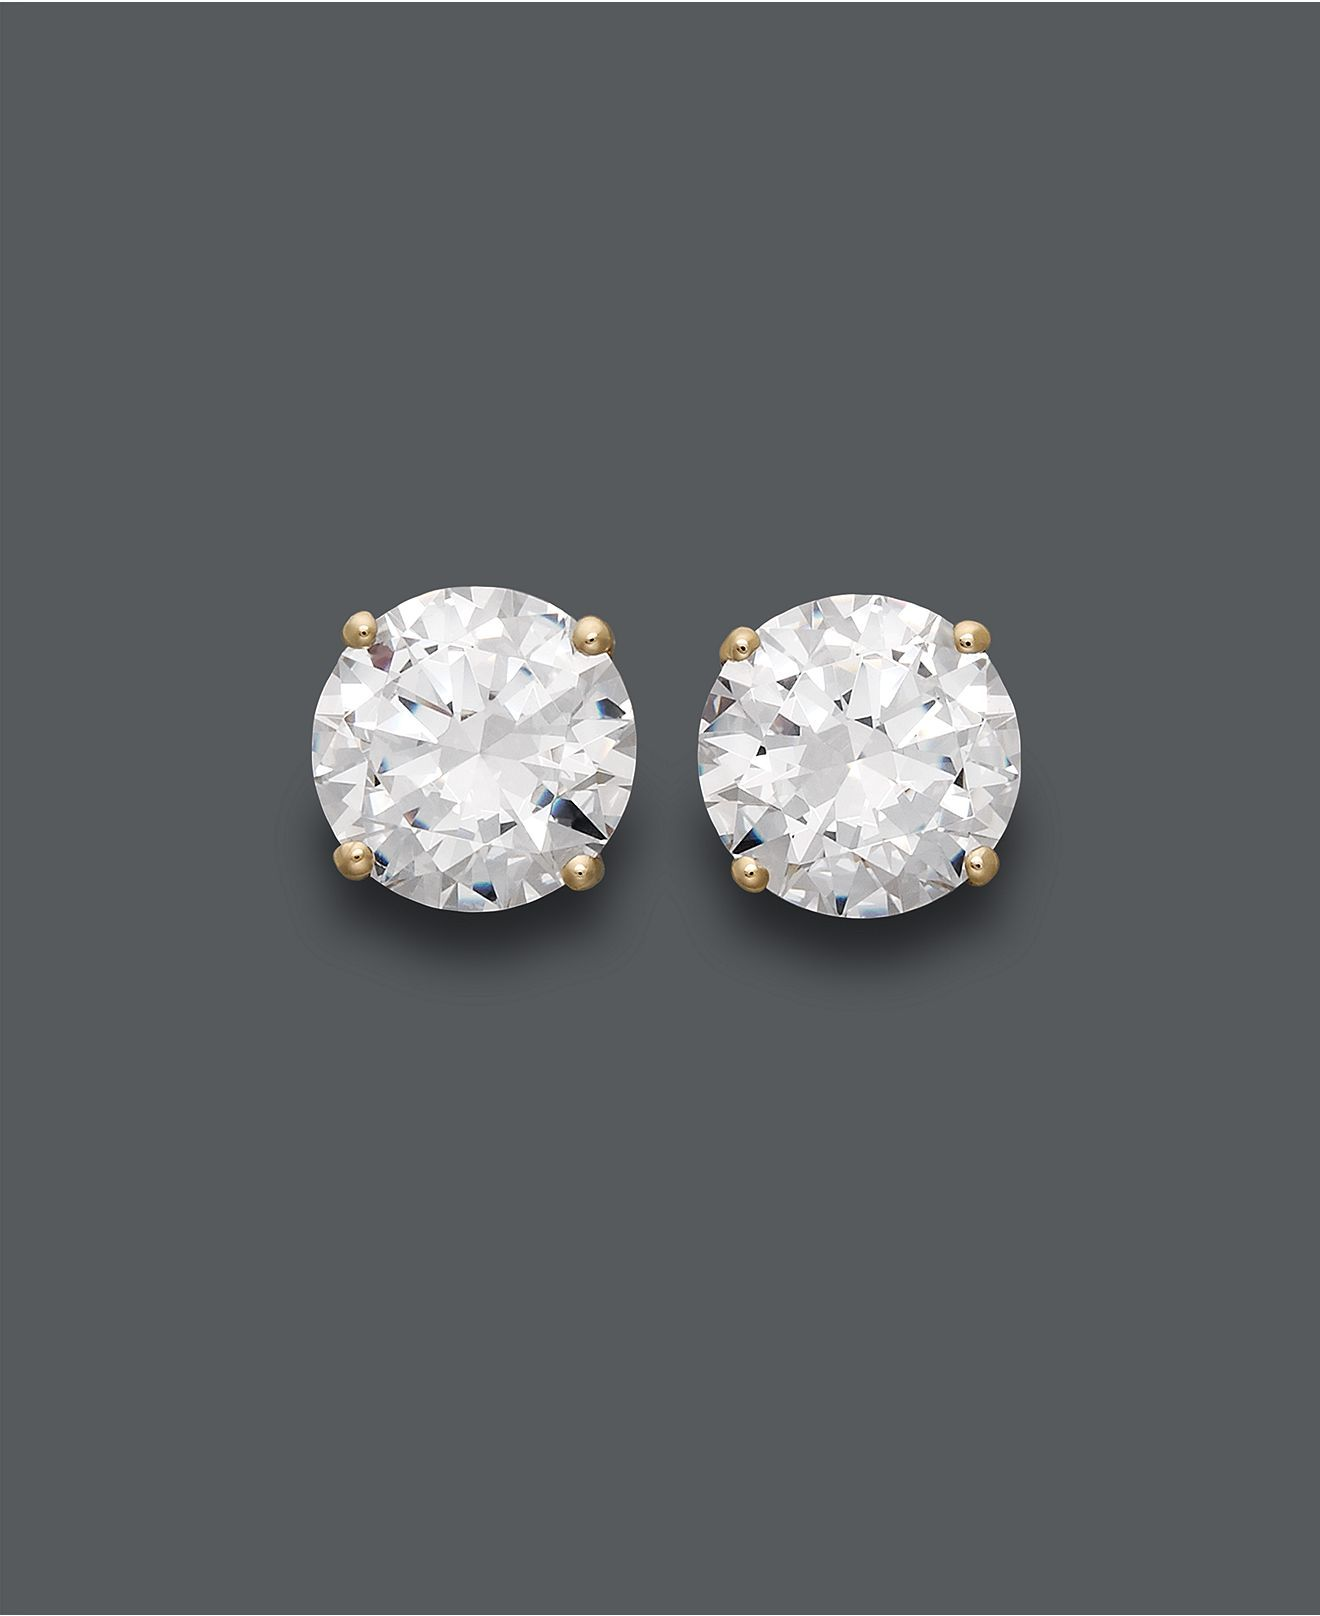 fdf7d4e44 Arabella 14k Gold Earrings, Swarovski Zirconia Round Stud Earrings (1-3/4  ct. t.w.-6-5/8 ct. t.w.) - Earrings - Jewelry & Watches - Macy's